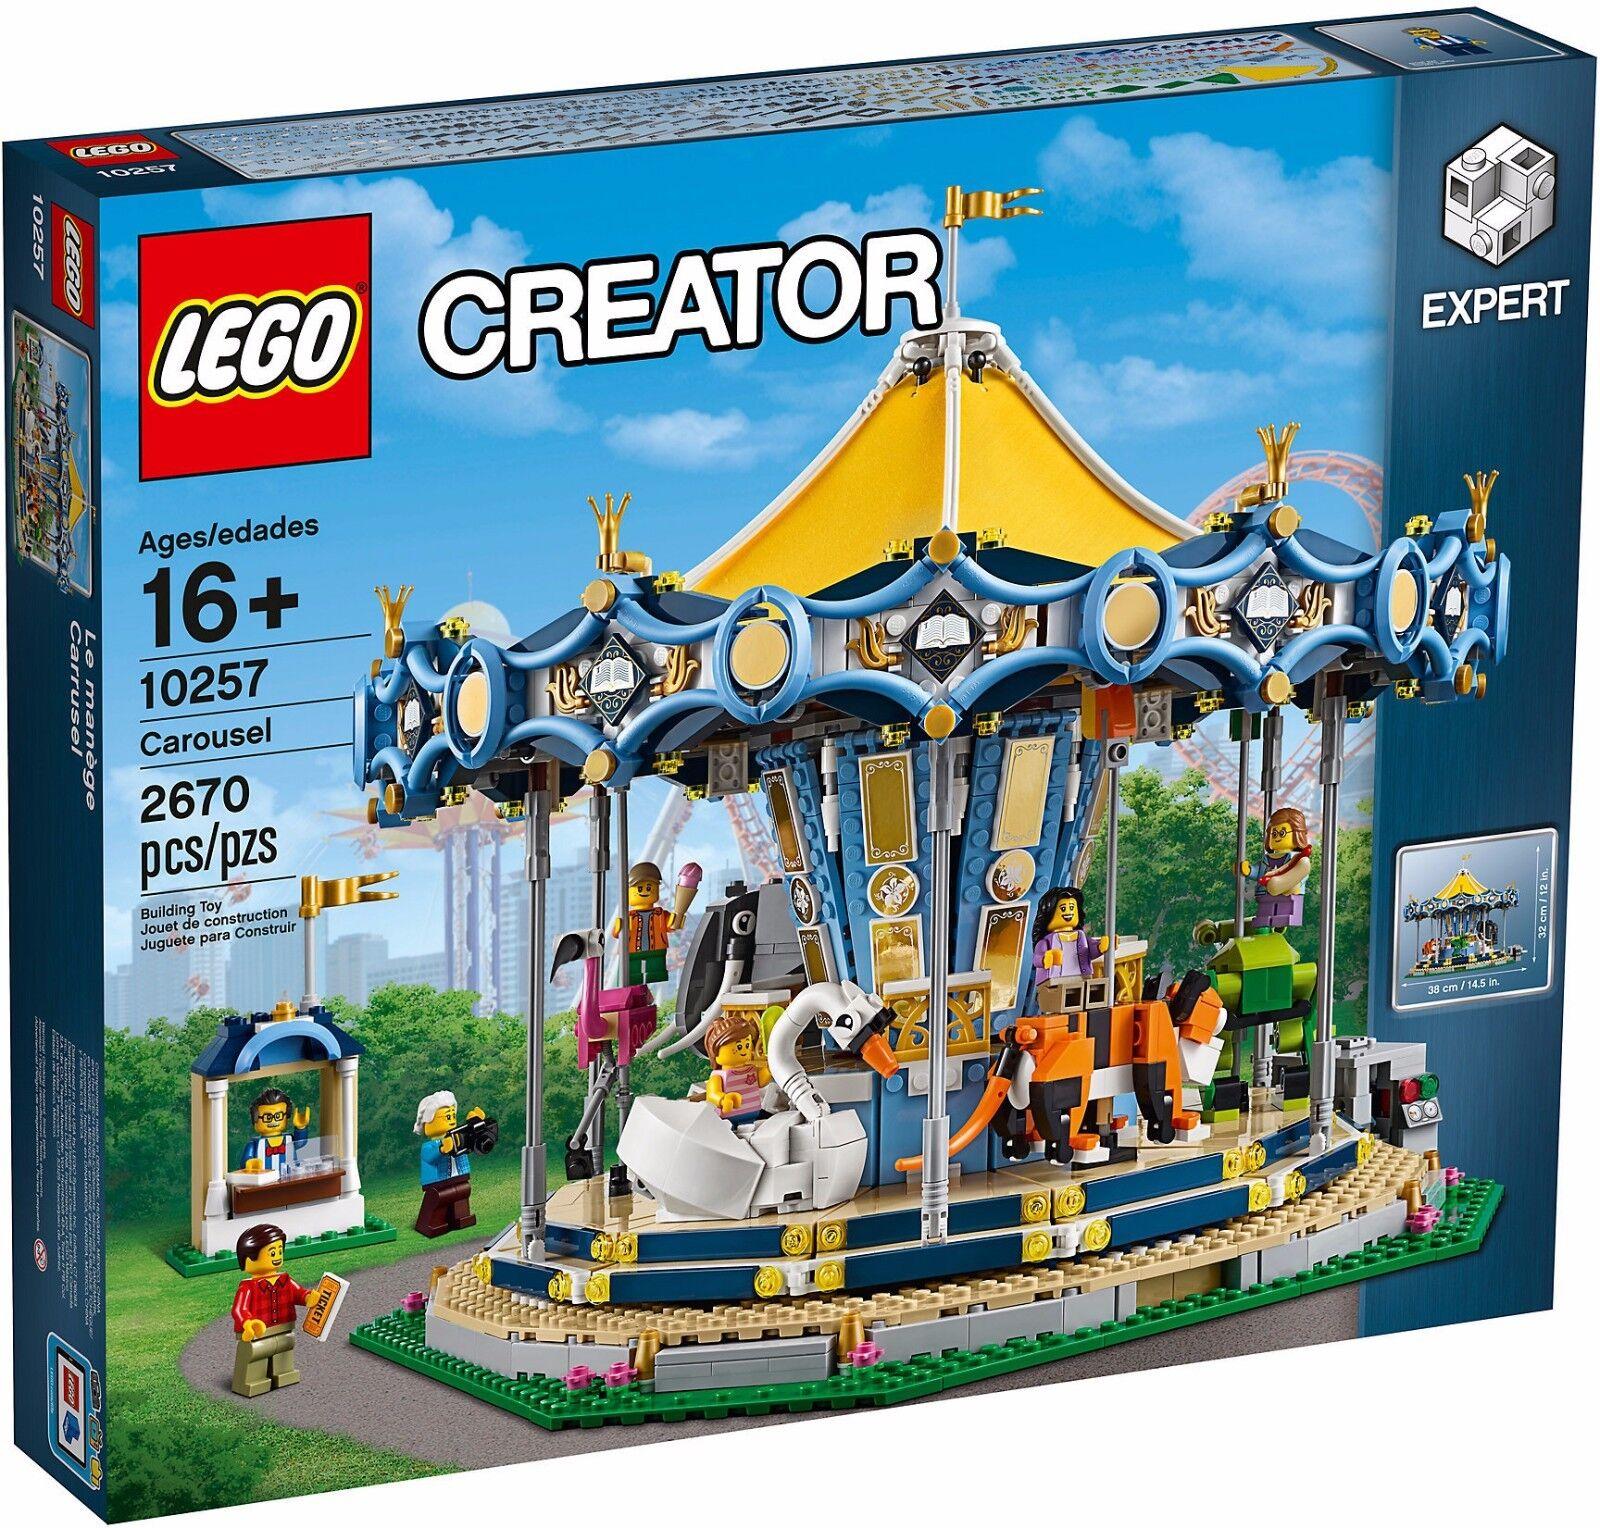 Lego Creator Coleccionistas 10257 Cocherusel Cocherusel Nuevo New